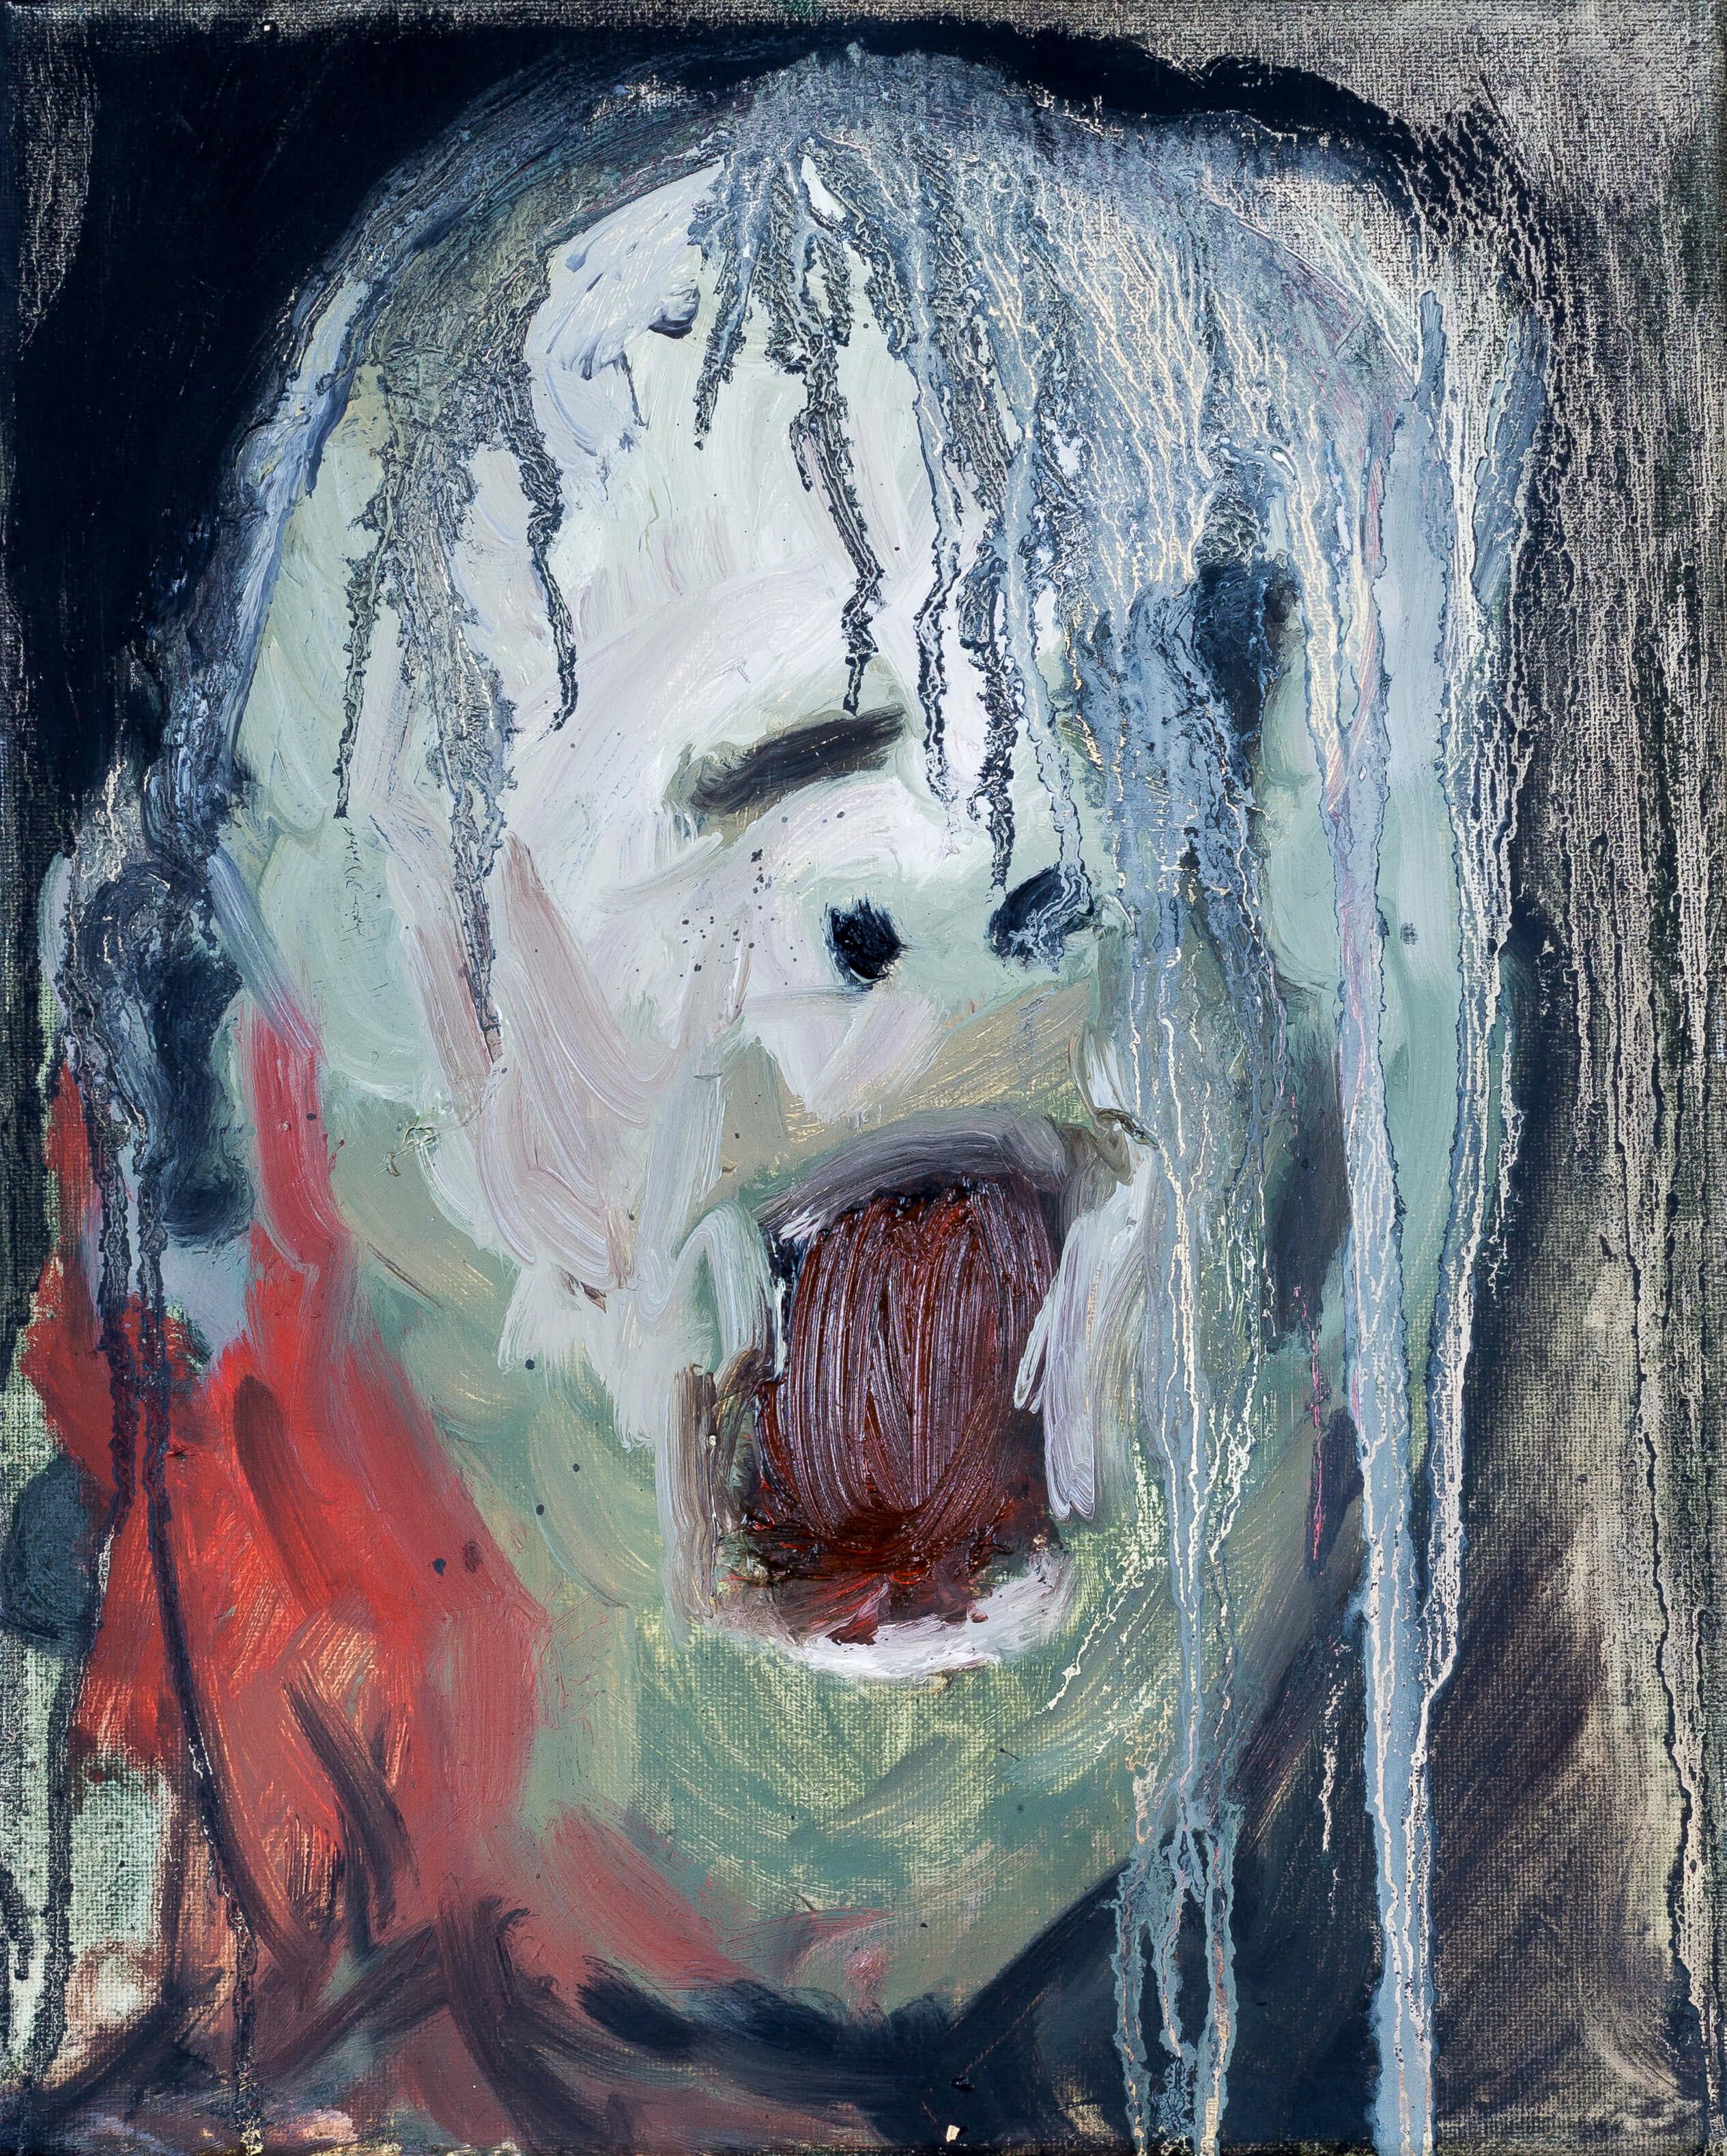 Katharina Albers, Transformation XXIII, 2011, Öl auf Leinwand, 30×24 cm